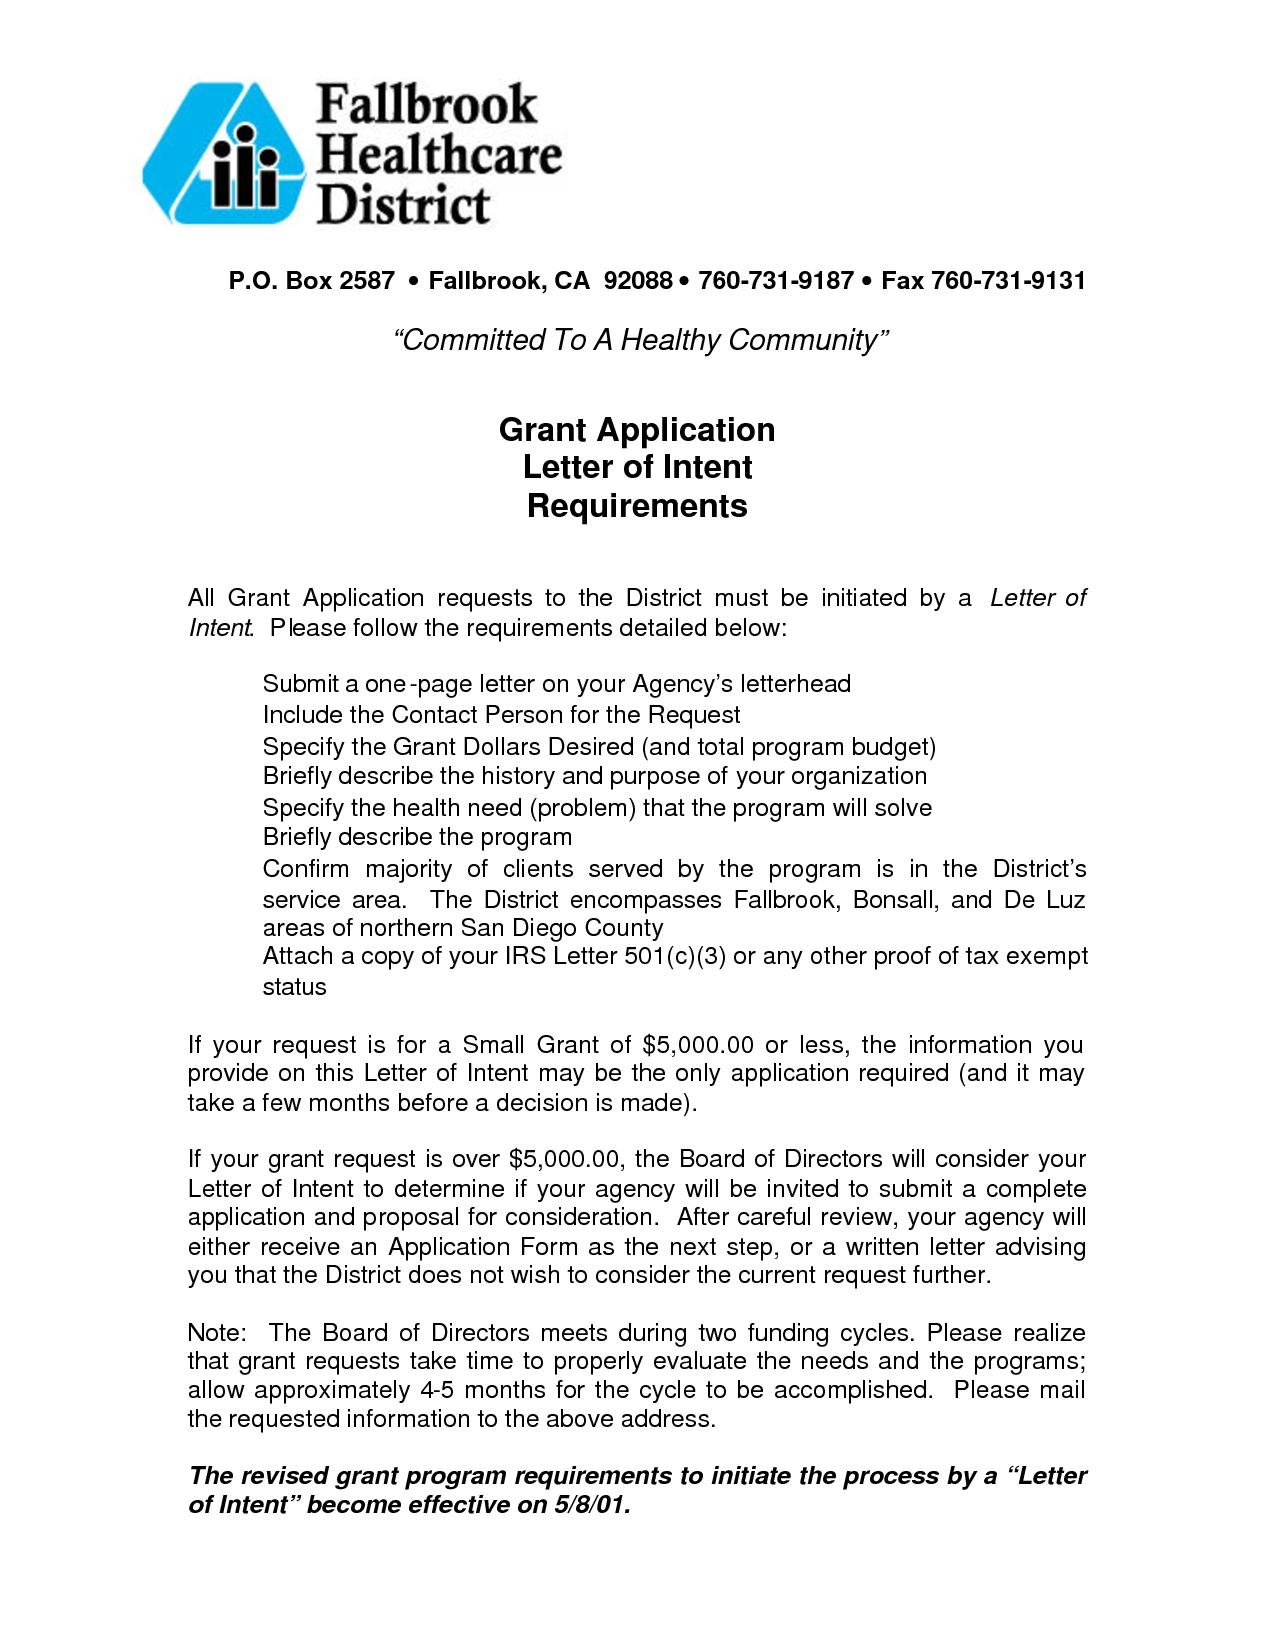 Grant Template For Nonprofit